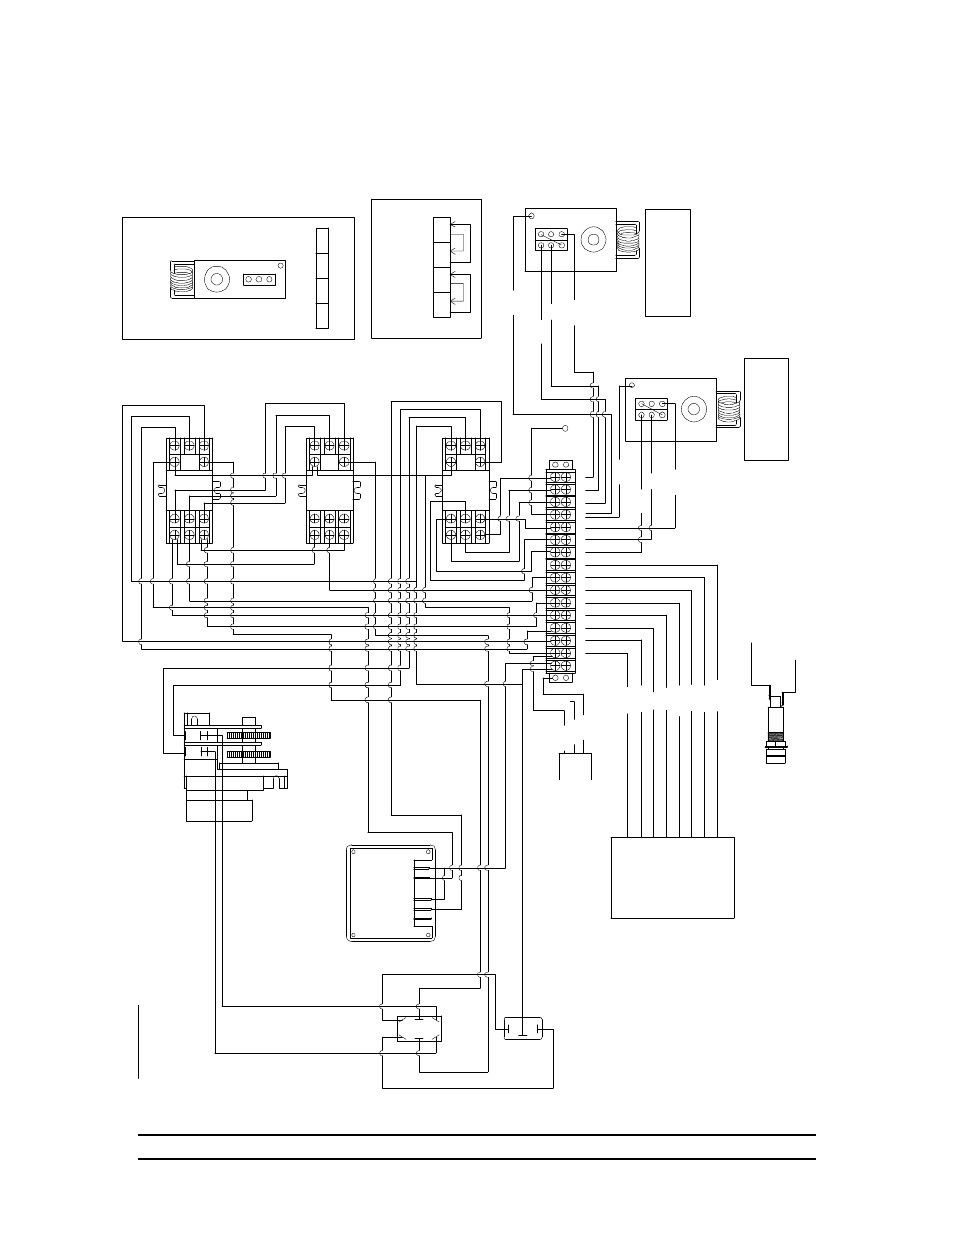 Hired Hand Curtain Machine Wiring Diagram : 41 Wiring